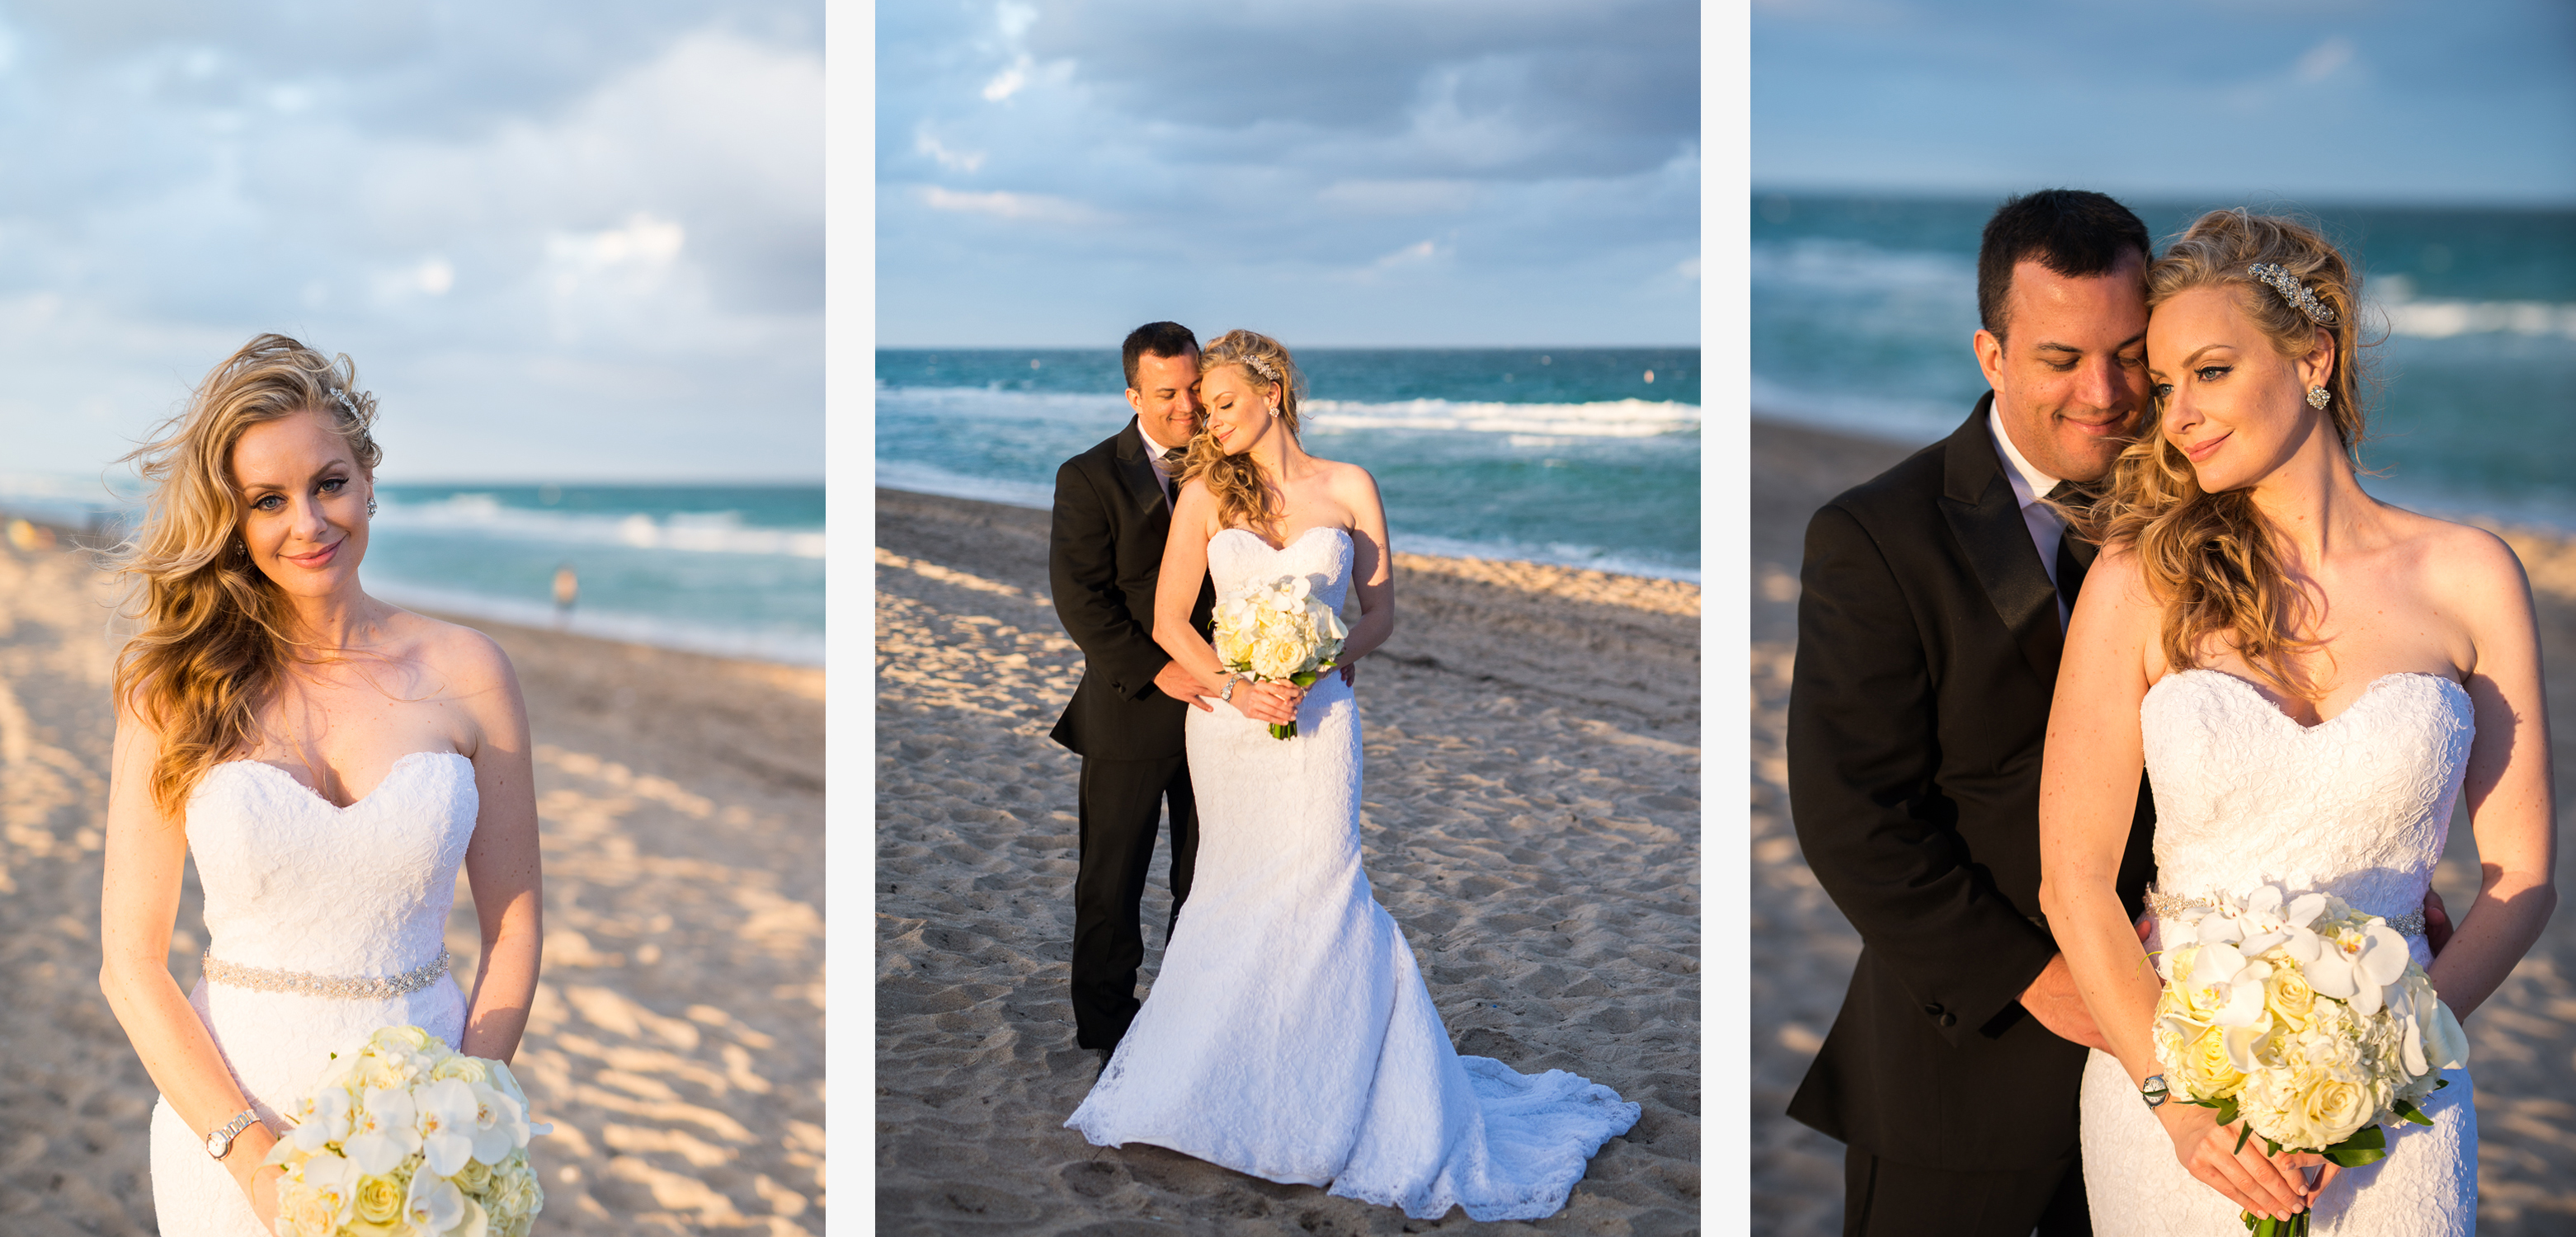 brandwold.se-miami-wedding-fortlauderdale-90